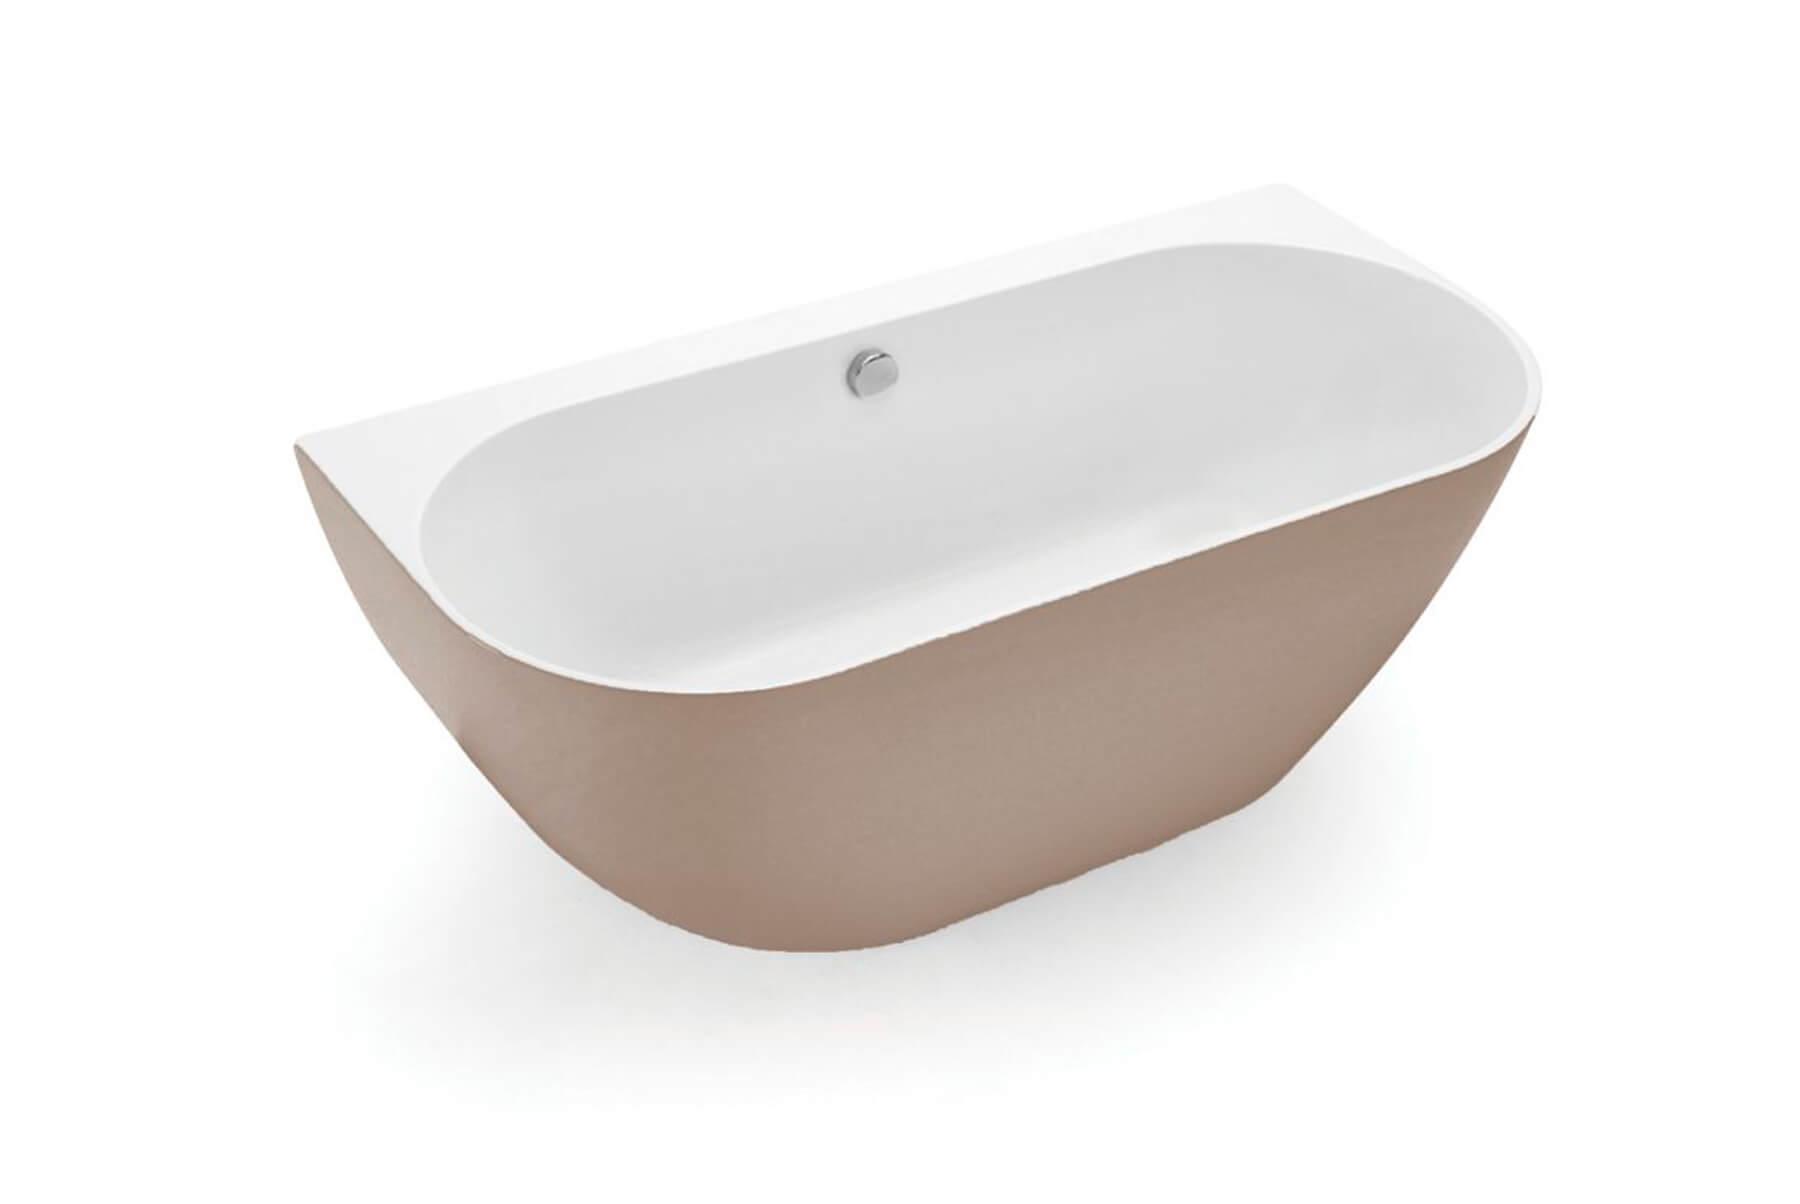 Bath-Tubs-WATERS-LOCHE-BTW-CUSTOM-COLOUR-STONE-1800x1204